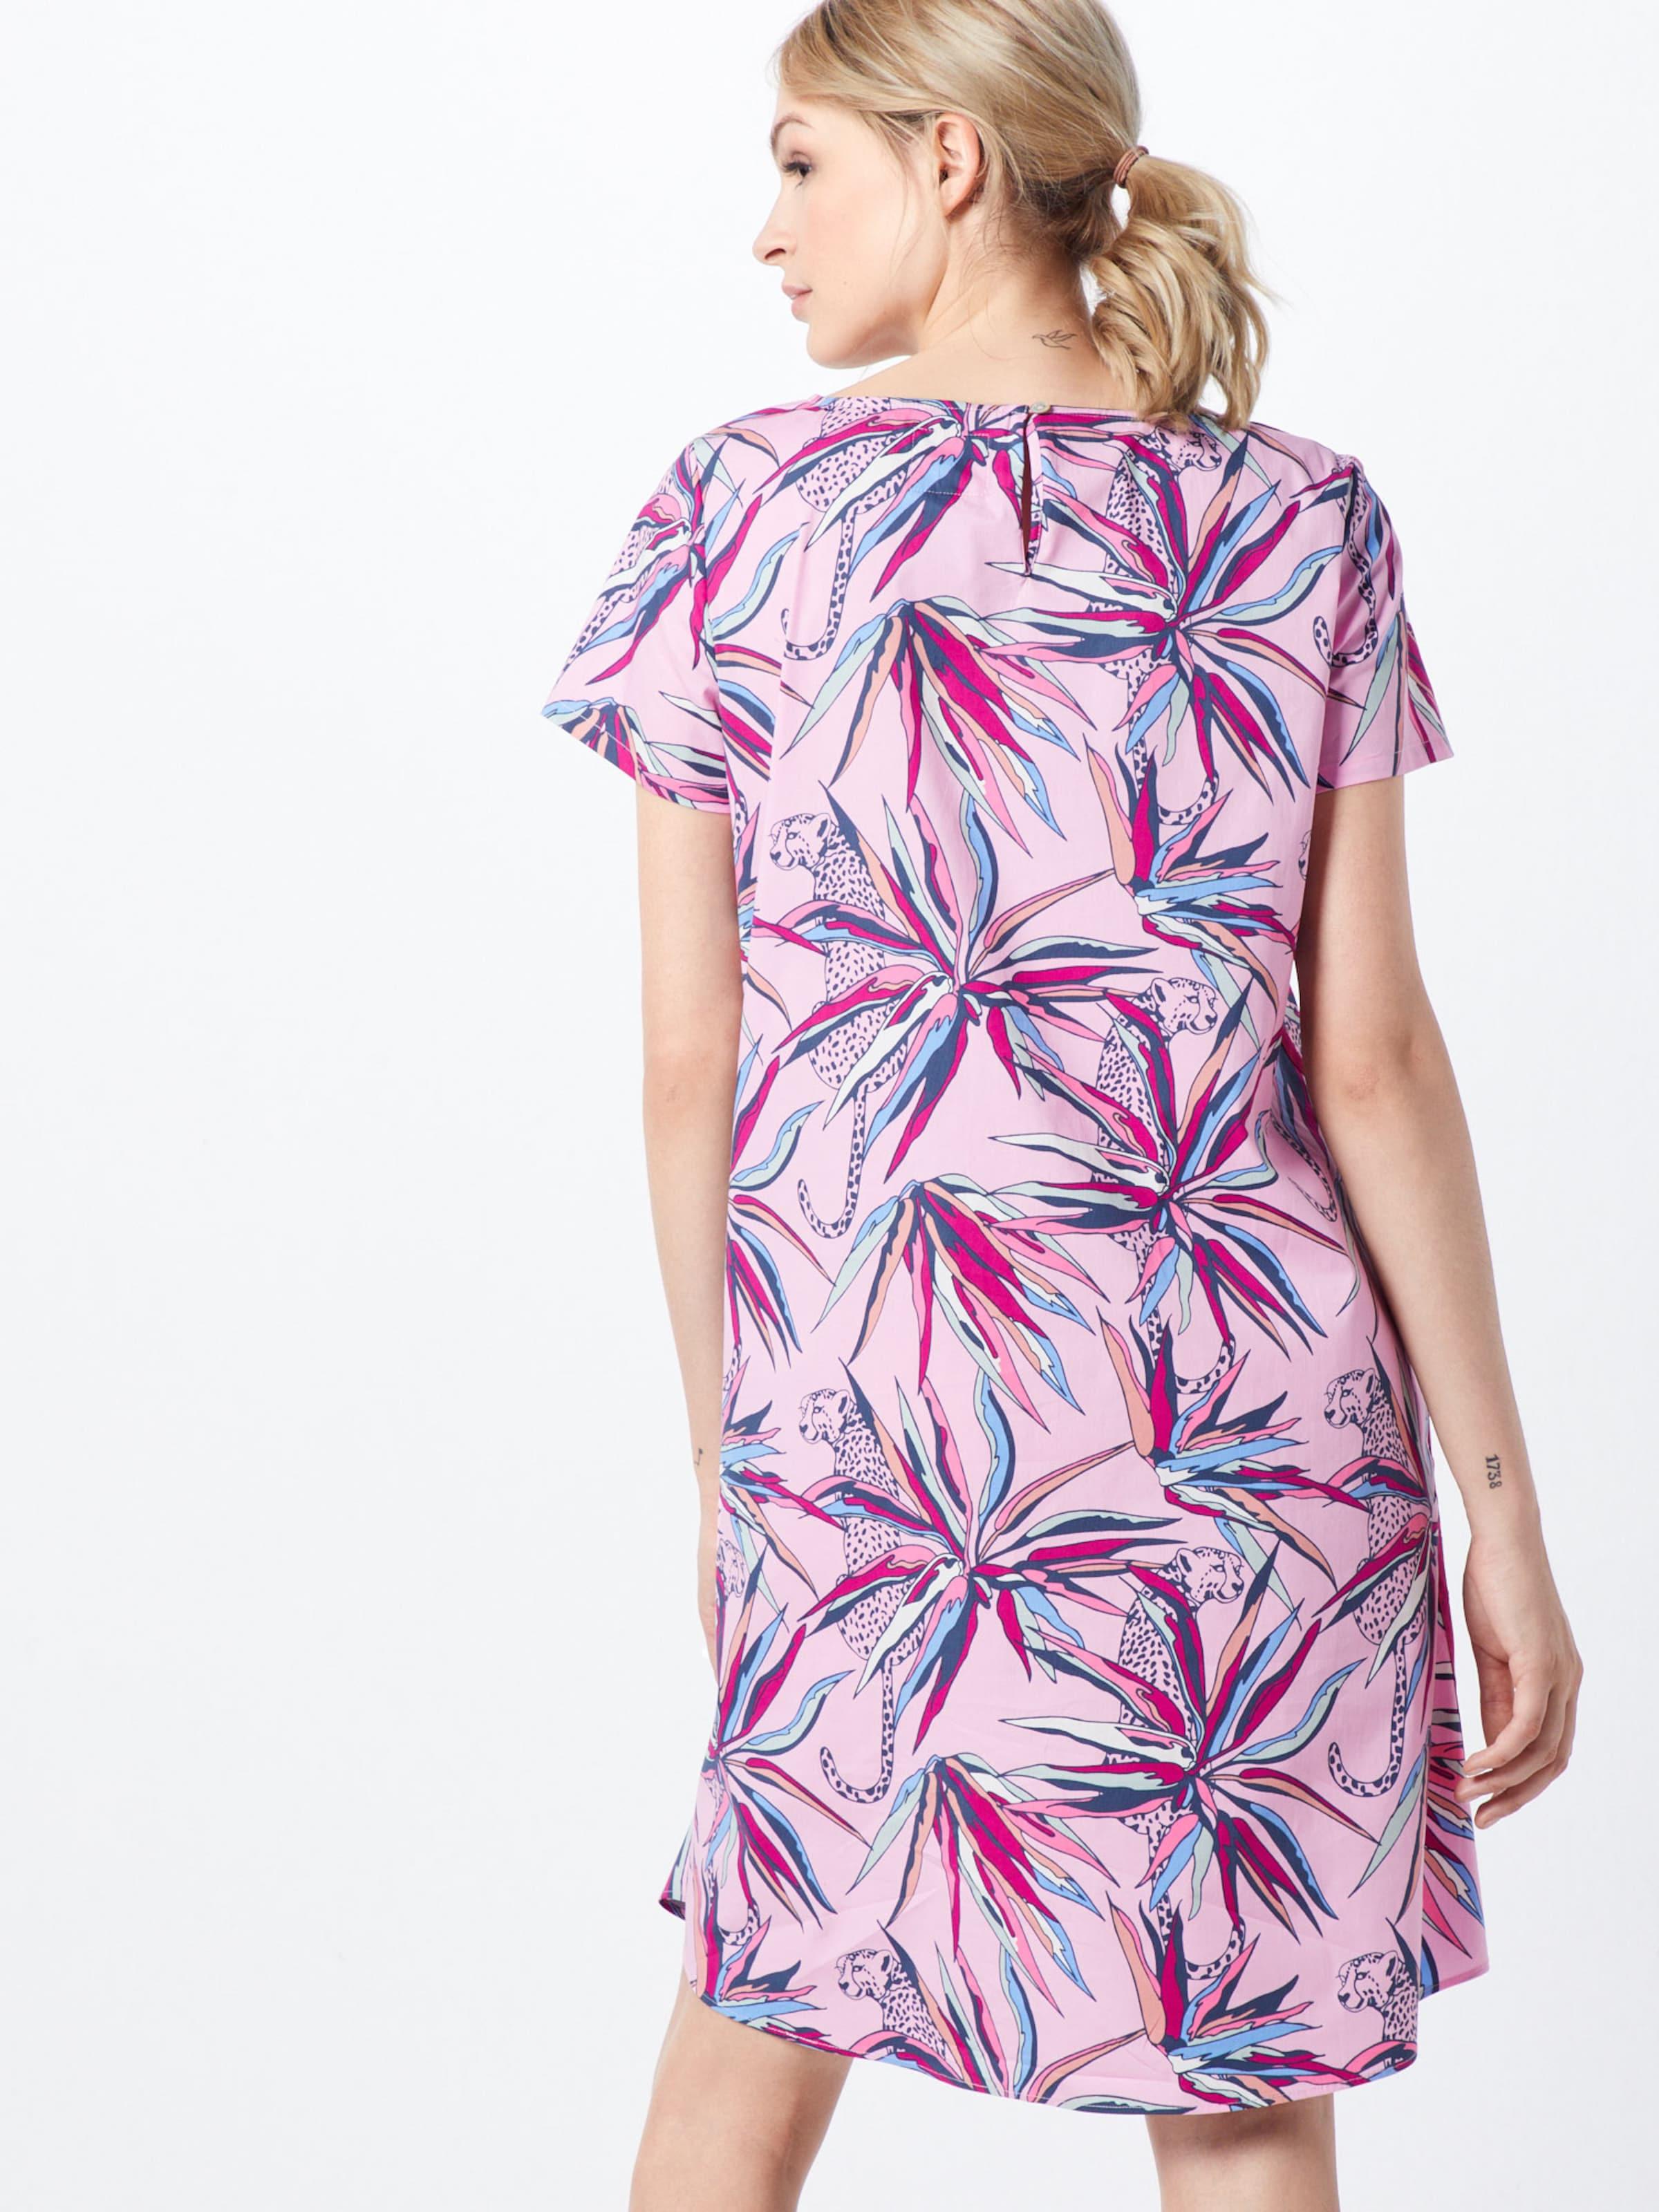 In Lieblingsstück Kleid Kleid 'elnal' 'elnal' Lieblingsstück In MischfarbenRosa PTkiuwOXZ